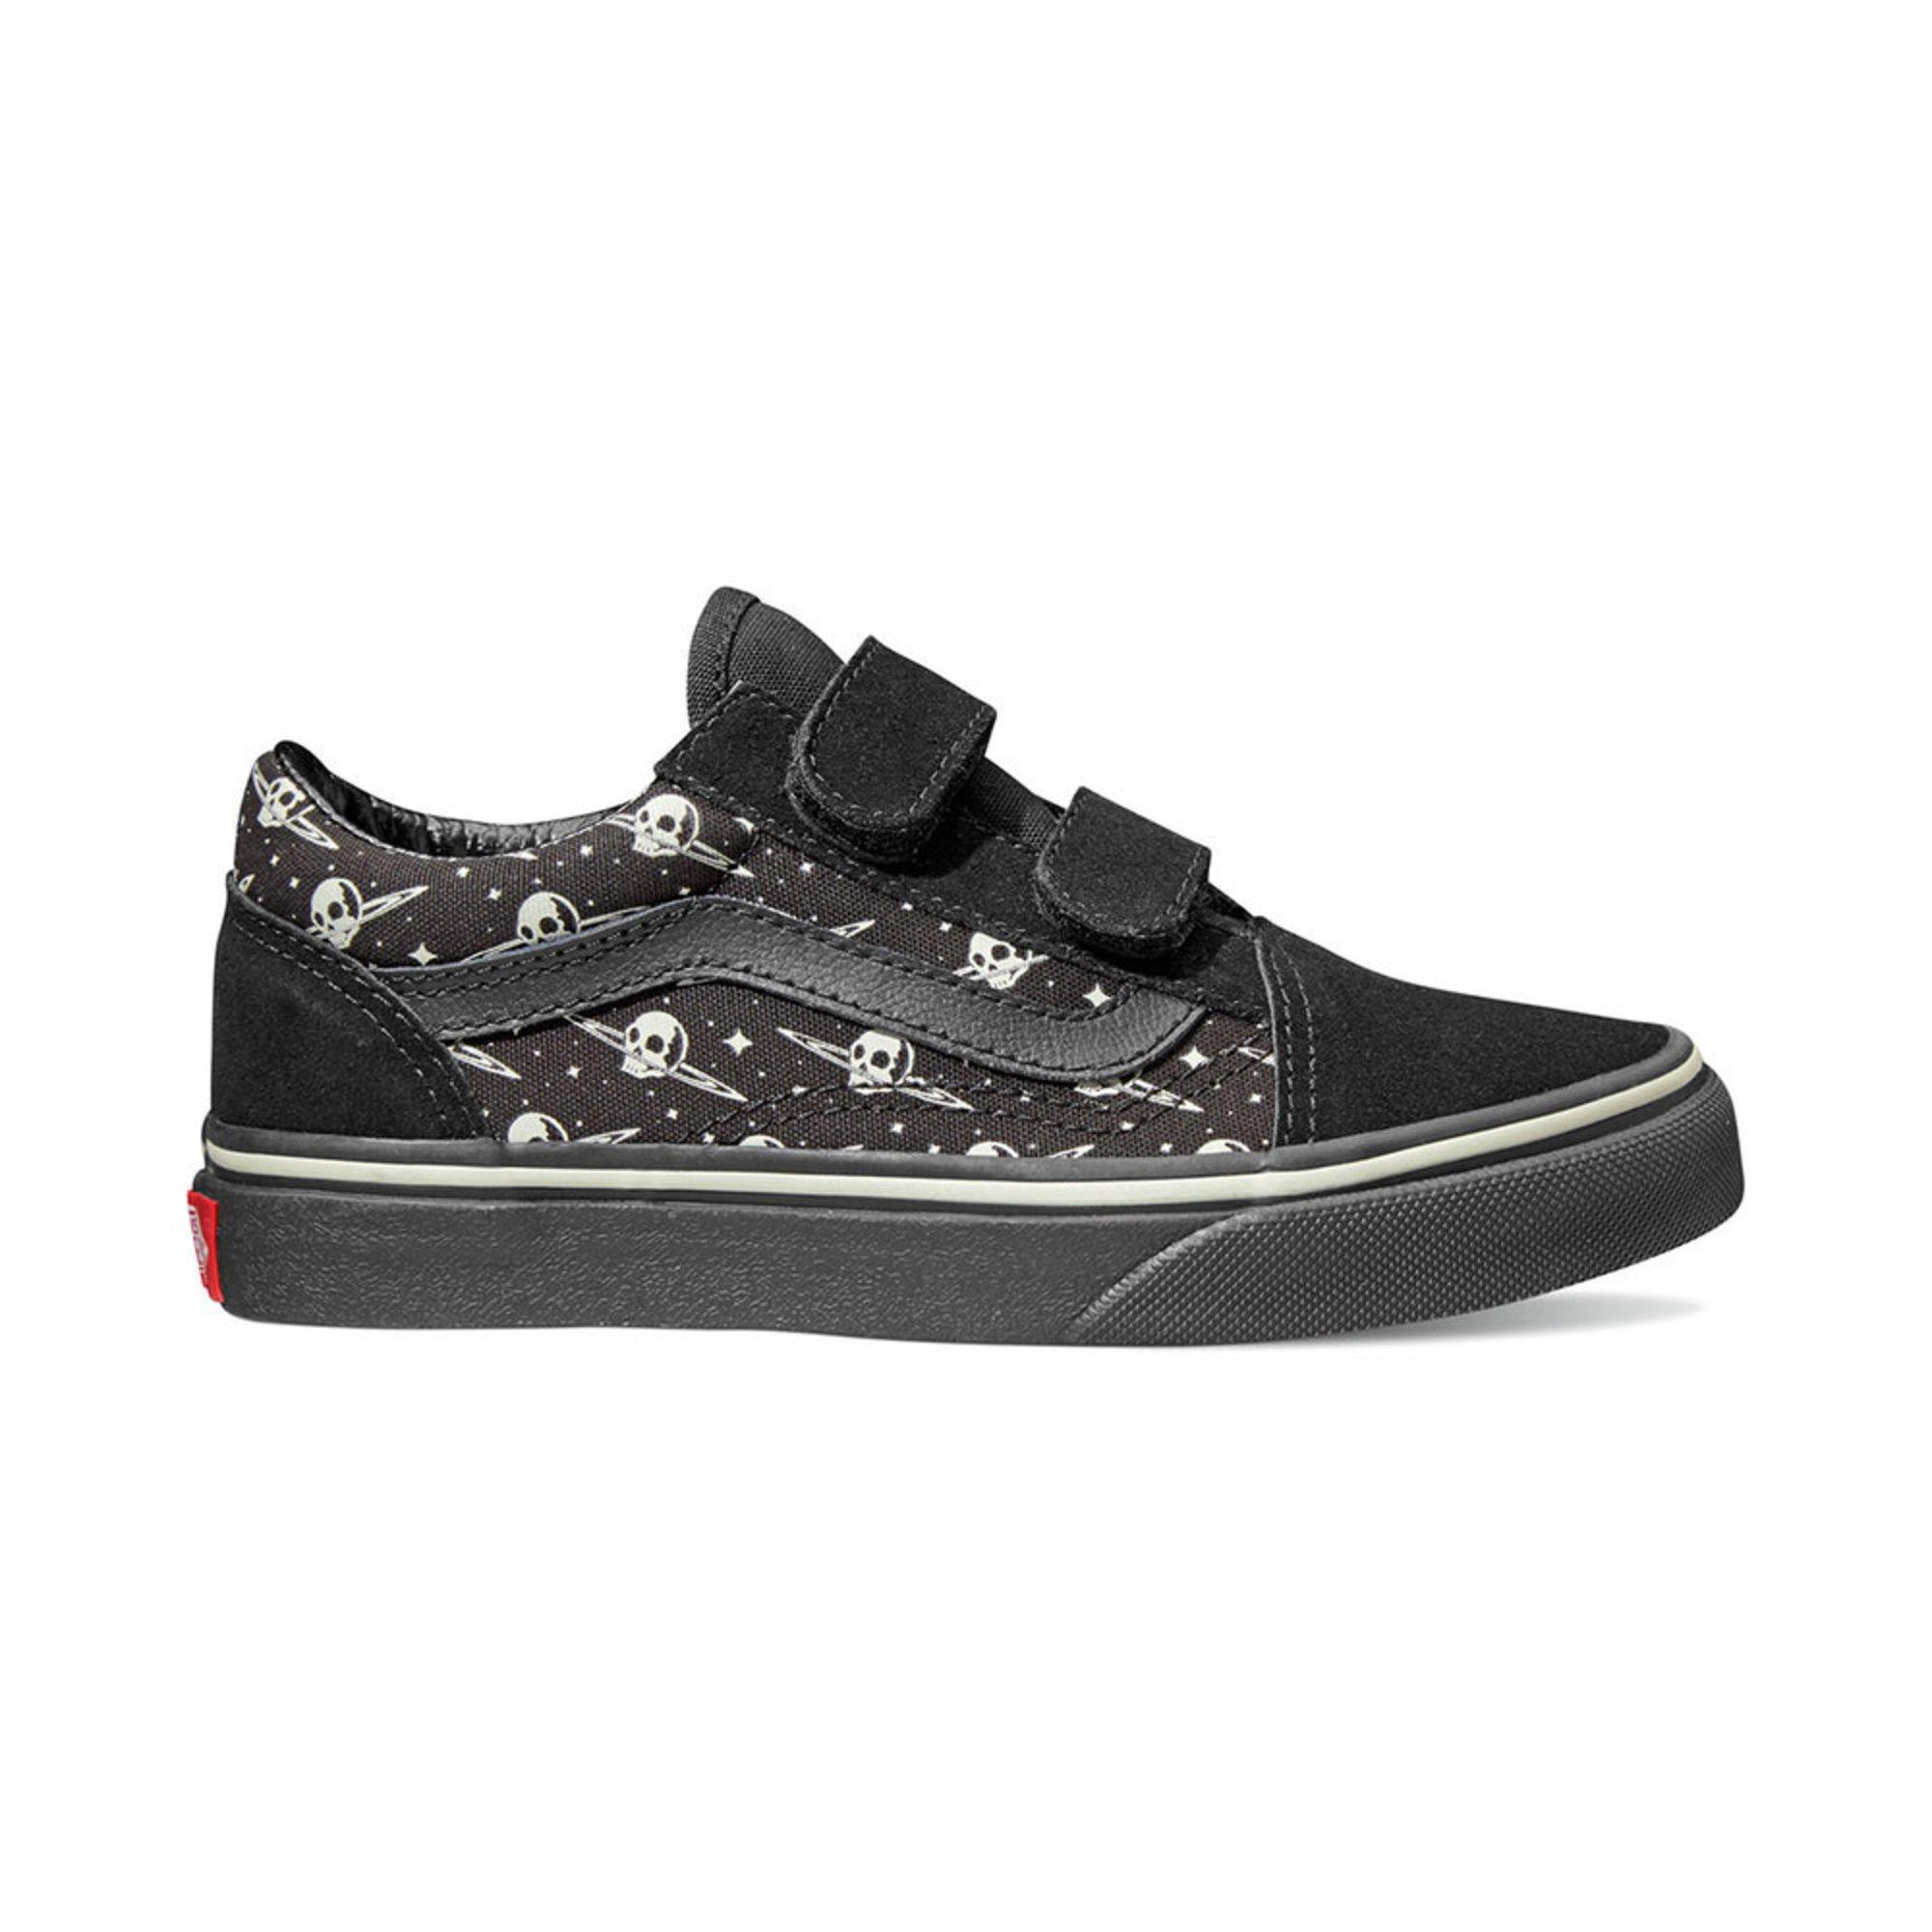 dd84fb472a Vans Boys Old Skool Velcro Skate Shoe (little Kid)